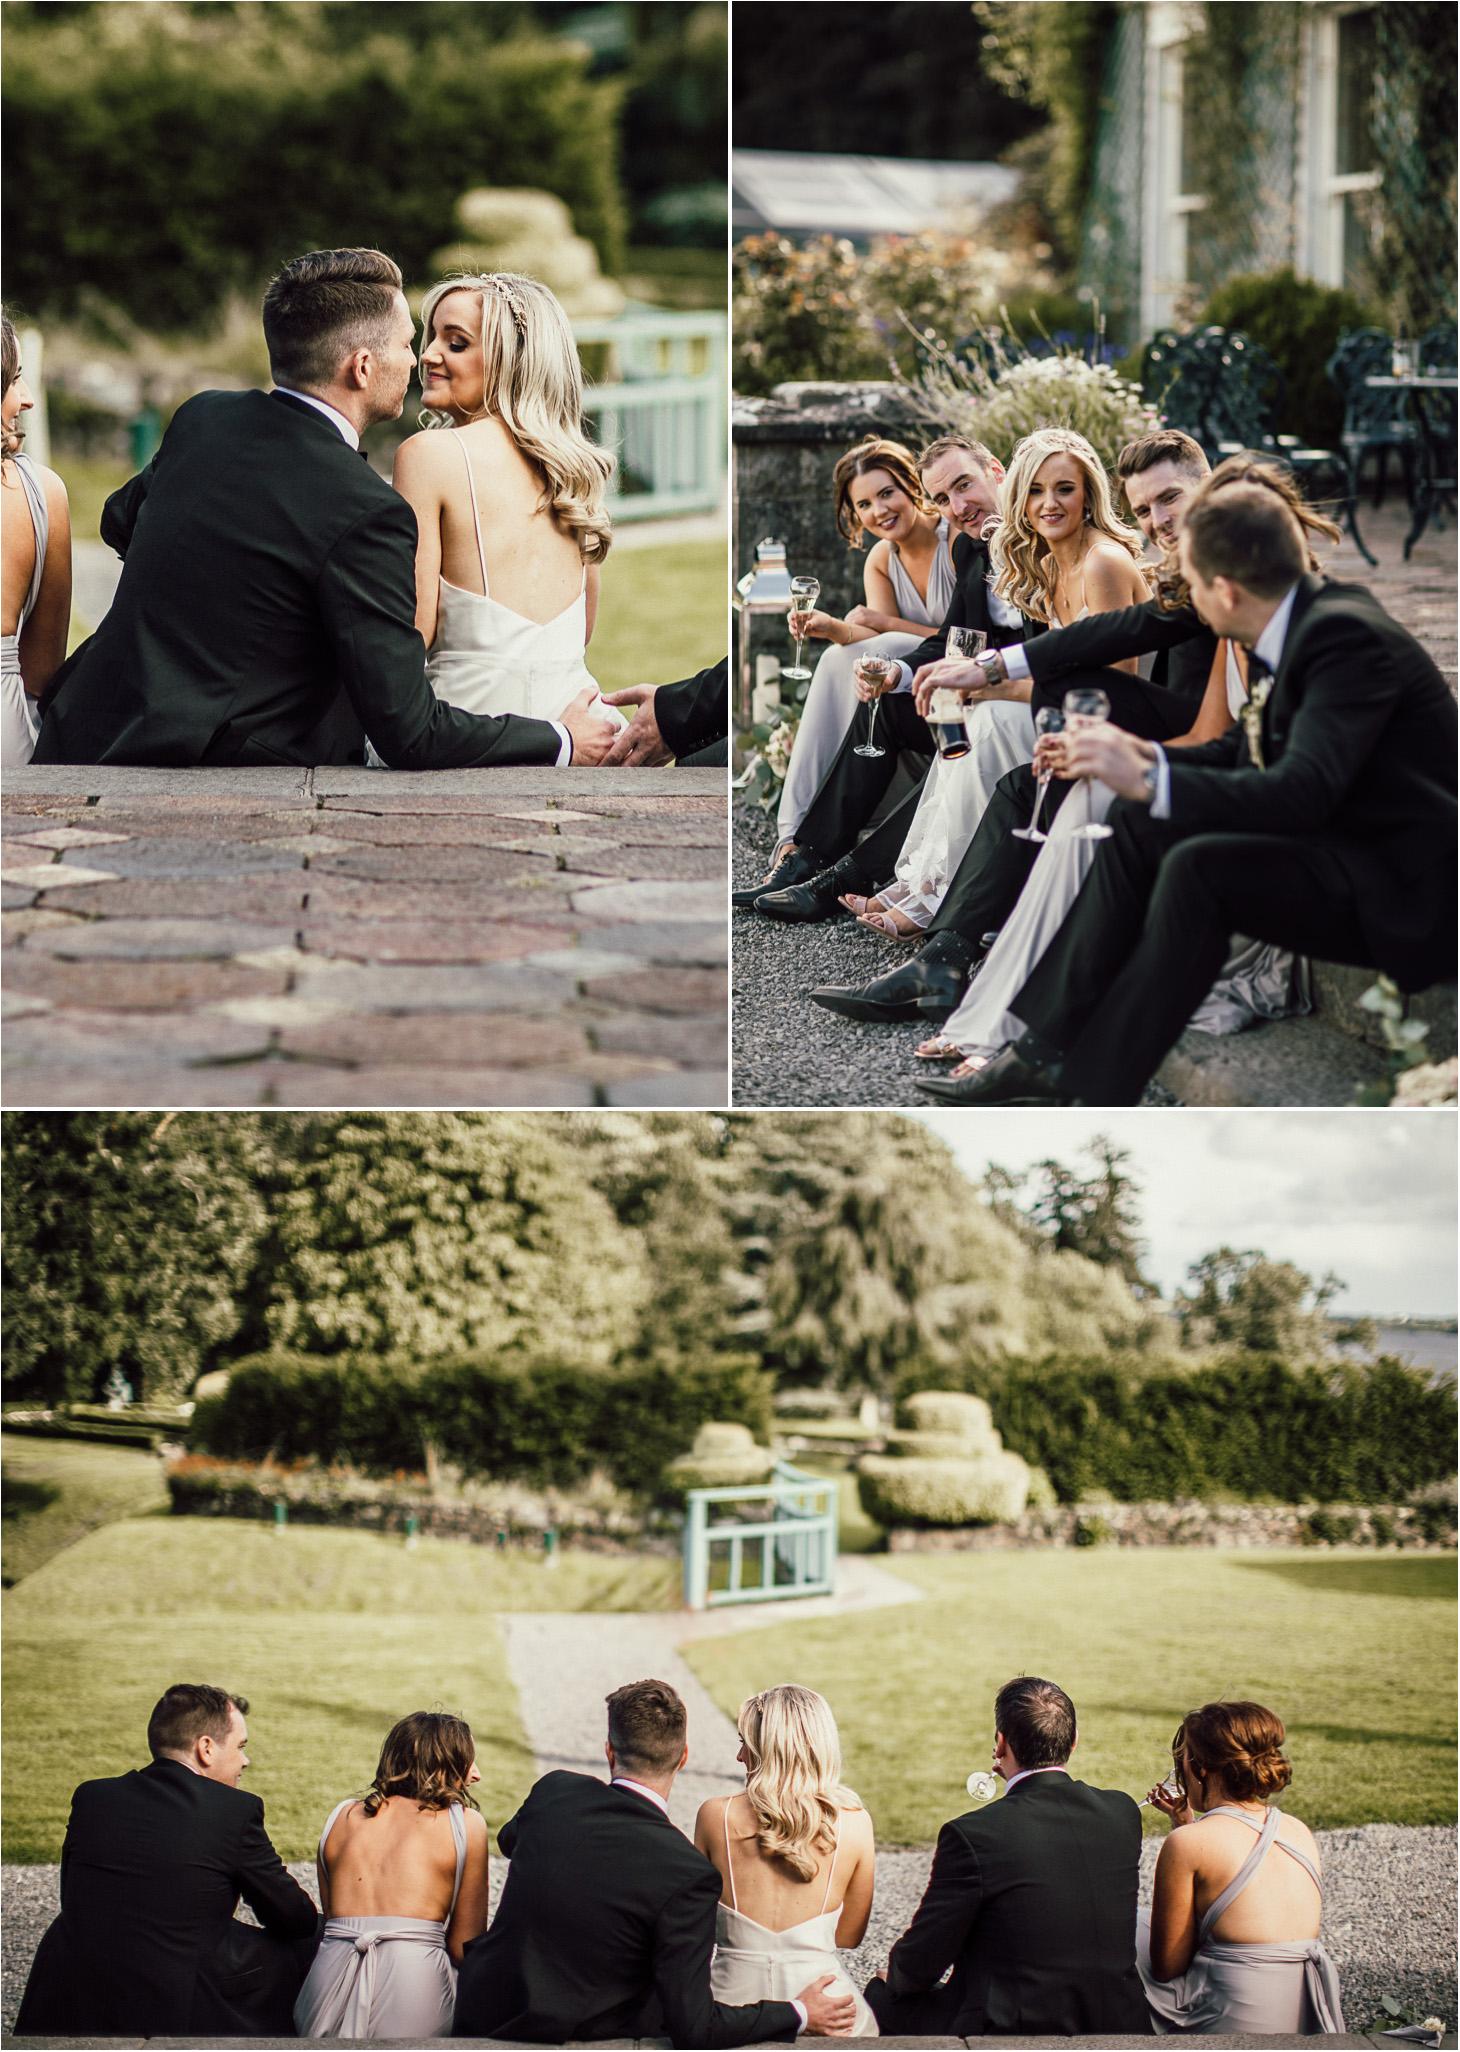 Virgina Lodge Photography. darren fitzpatrick. Wedding.26